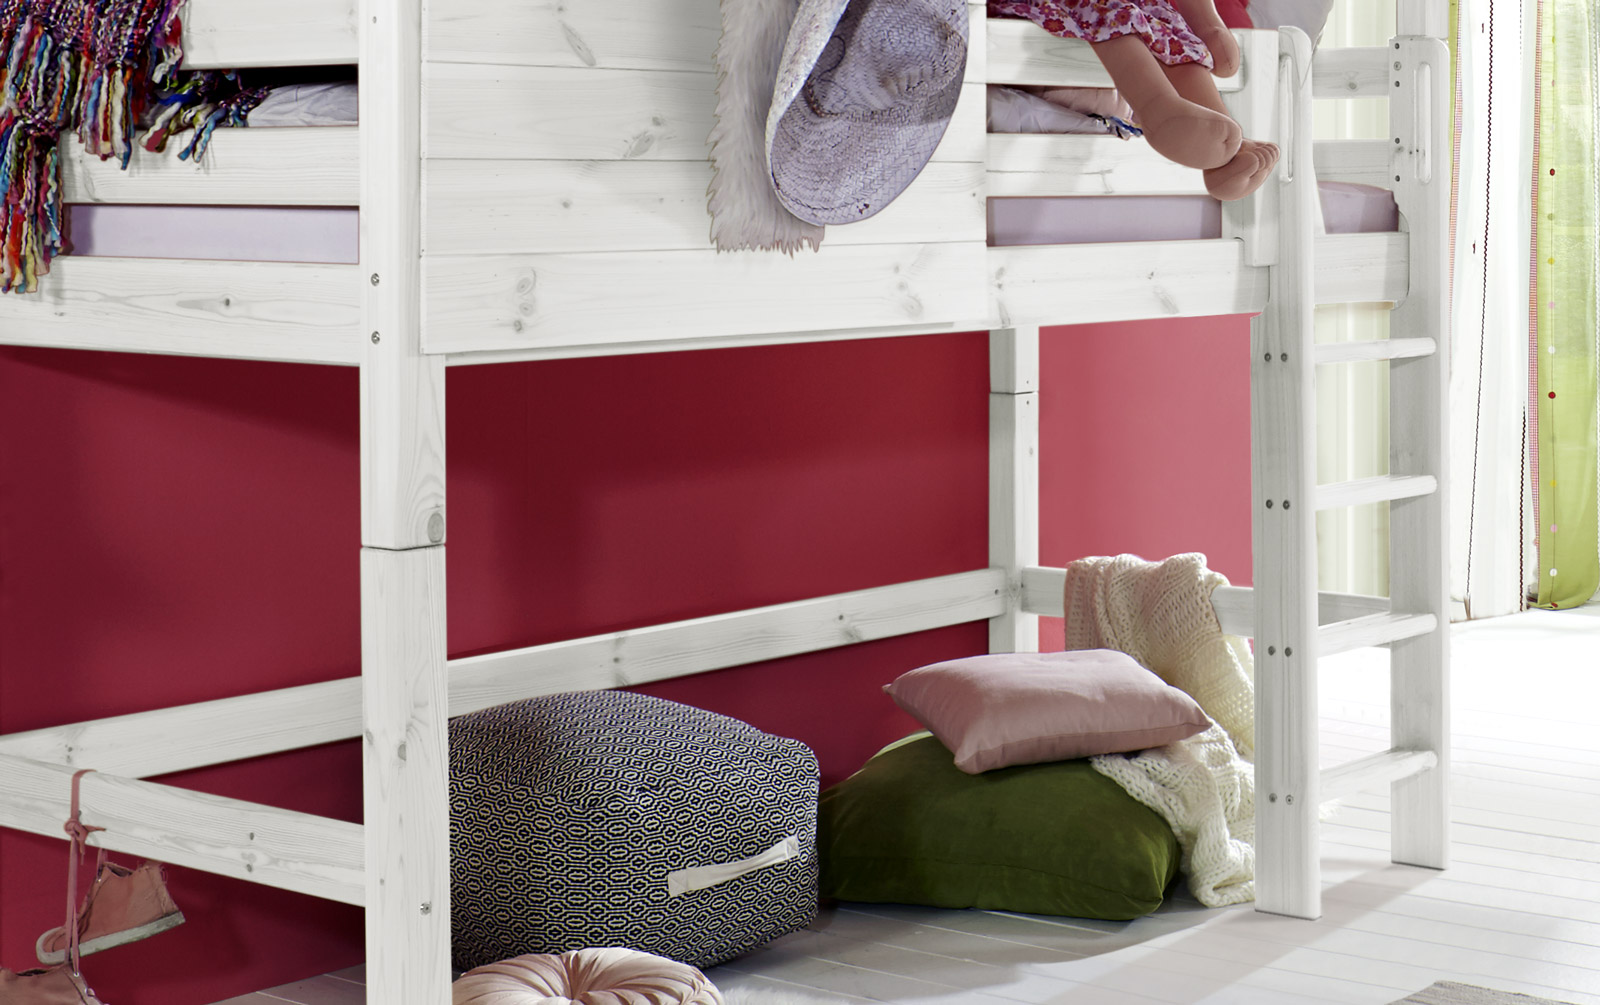 design gardinen schlafzimmer. Black Bedroom Furniture Sets. Home Design Ideas